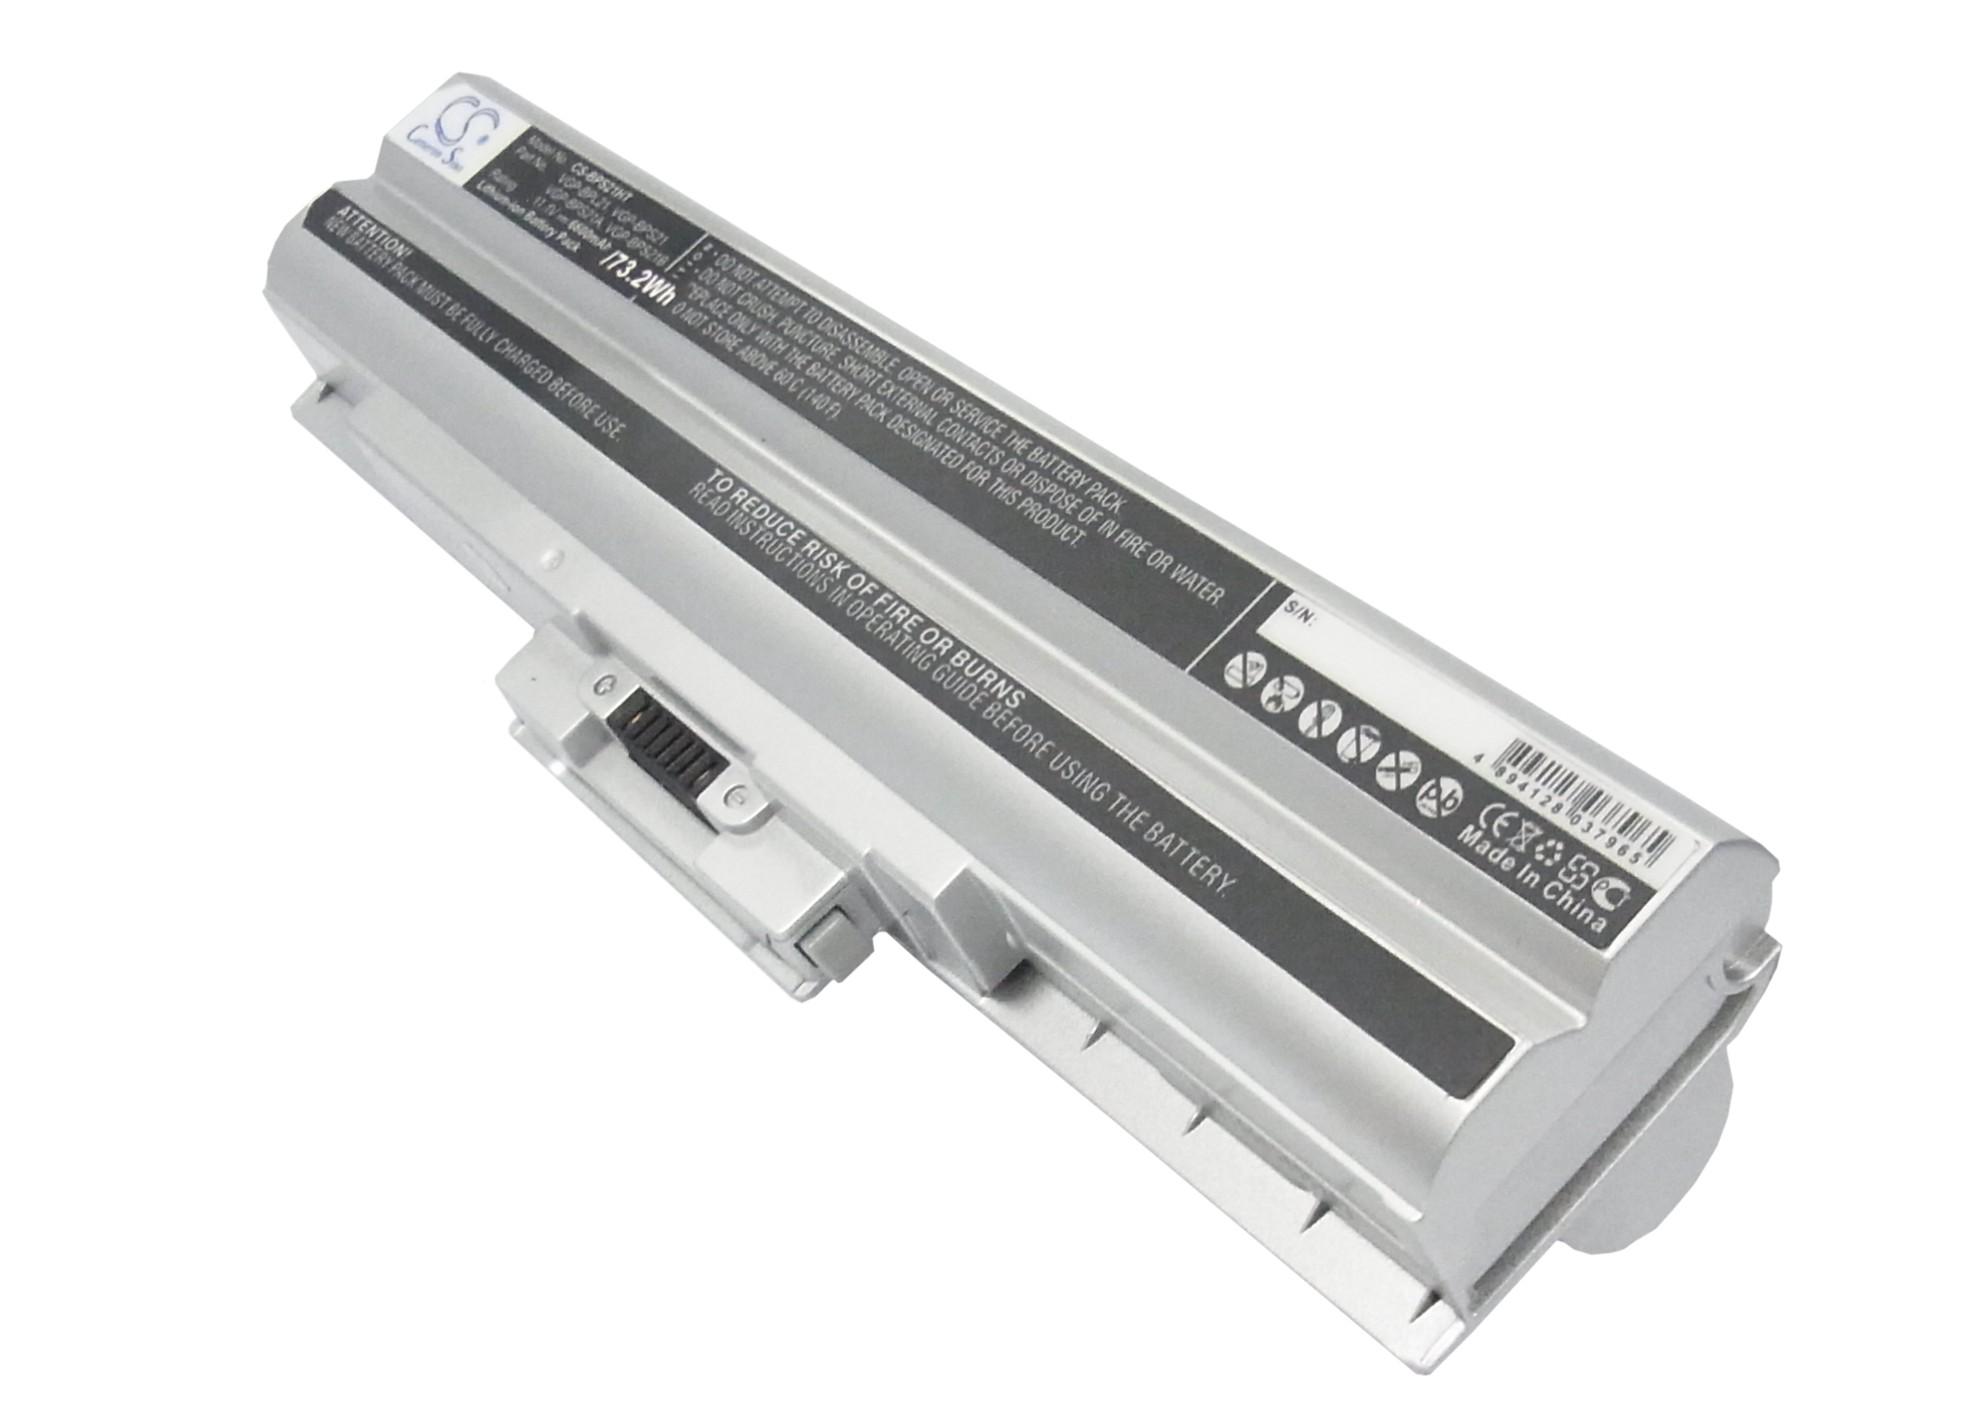 Cameron Sino baterie do notebooků pro SONY VAIO VPCF11Z1E 11.1V Li-ion 6600mAh stříbrná - neoriginální